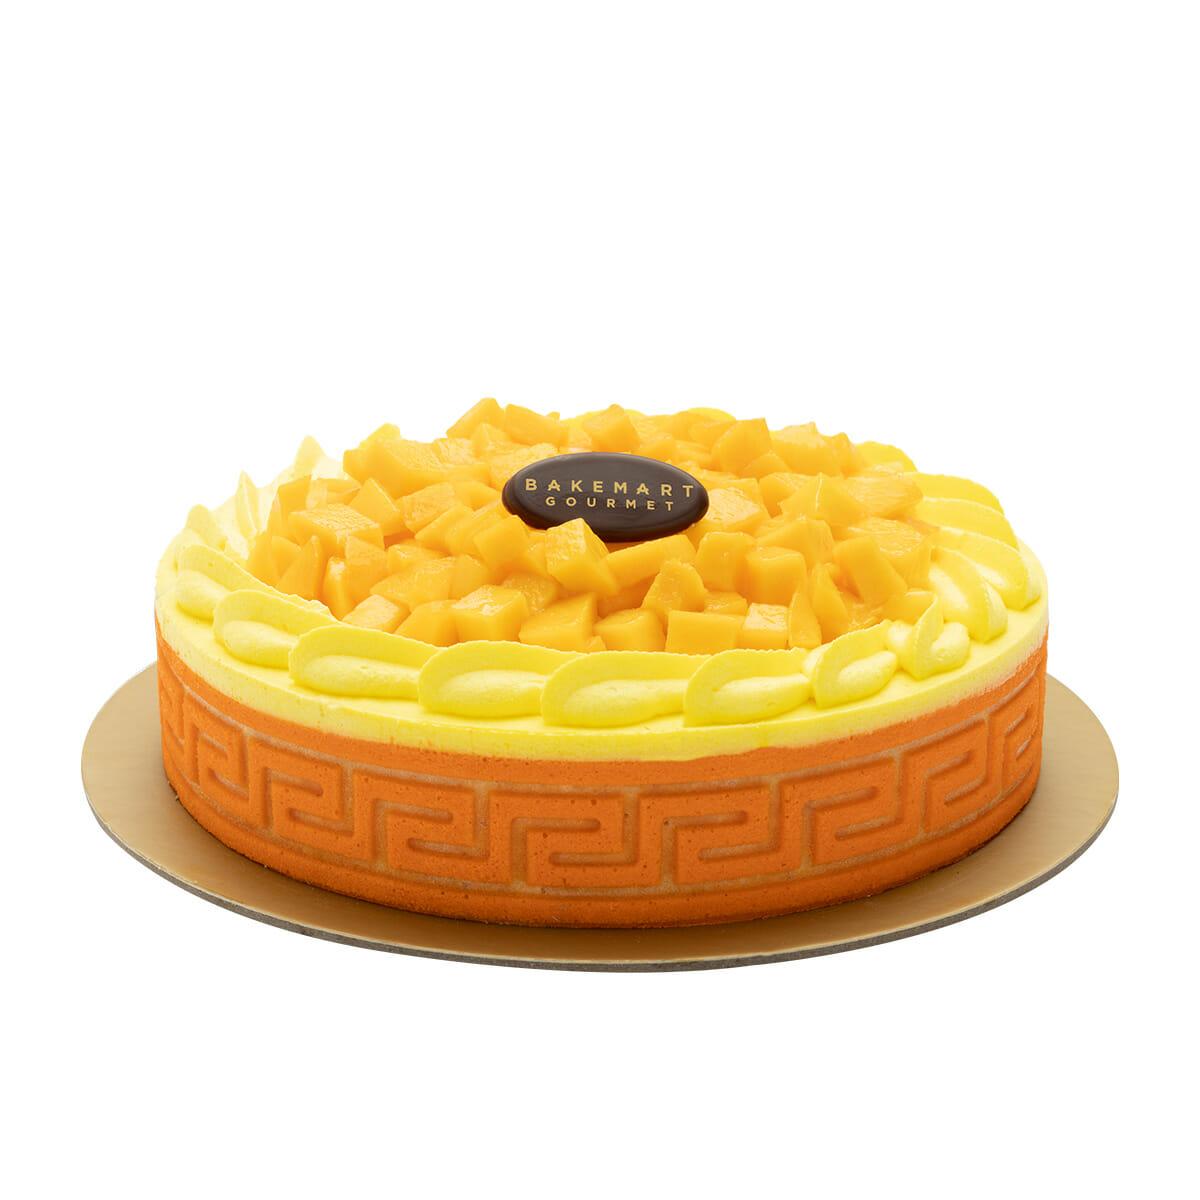 Bakemart-Gourmet-Mango-Mousse-Premium-Cake